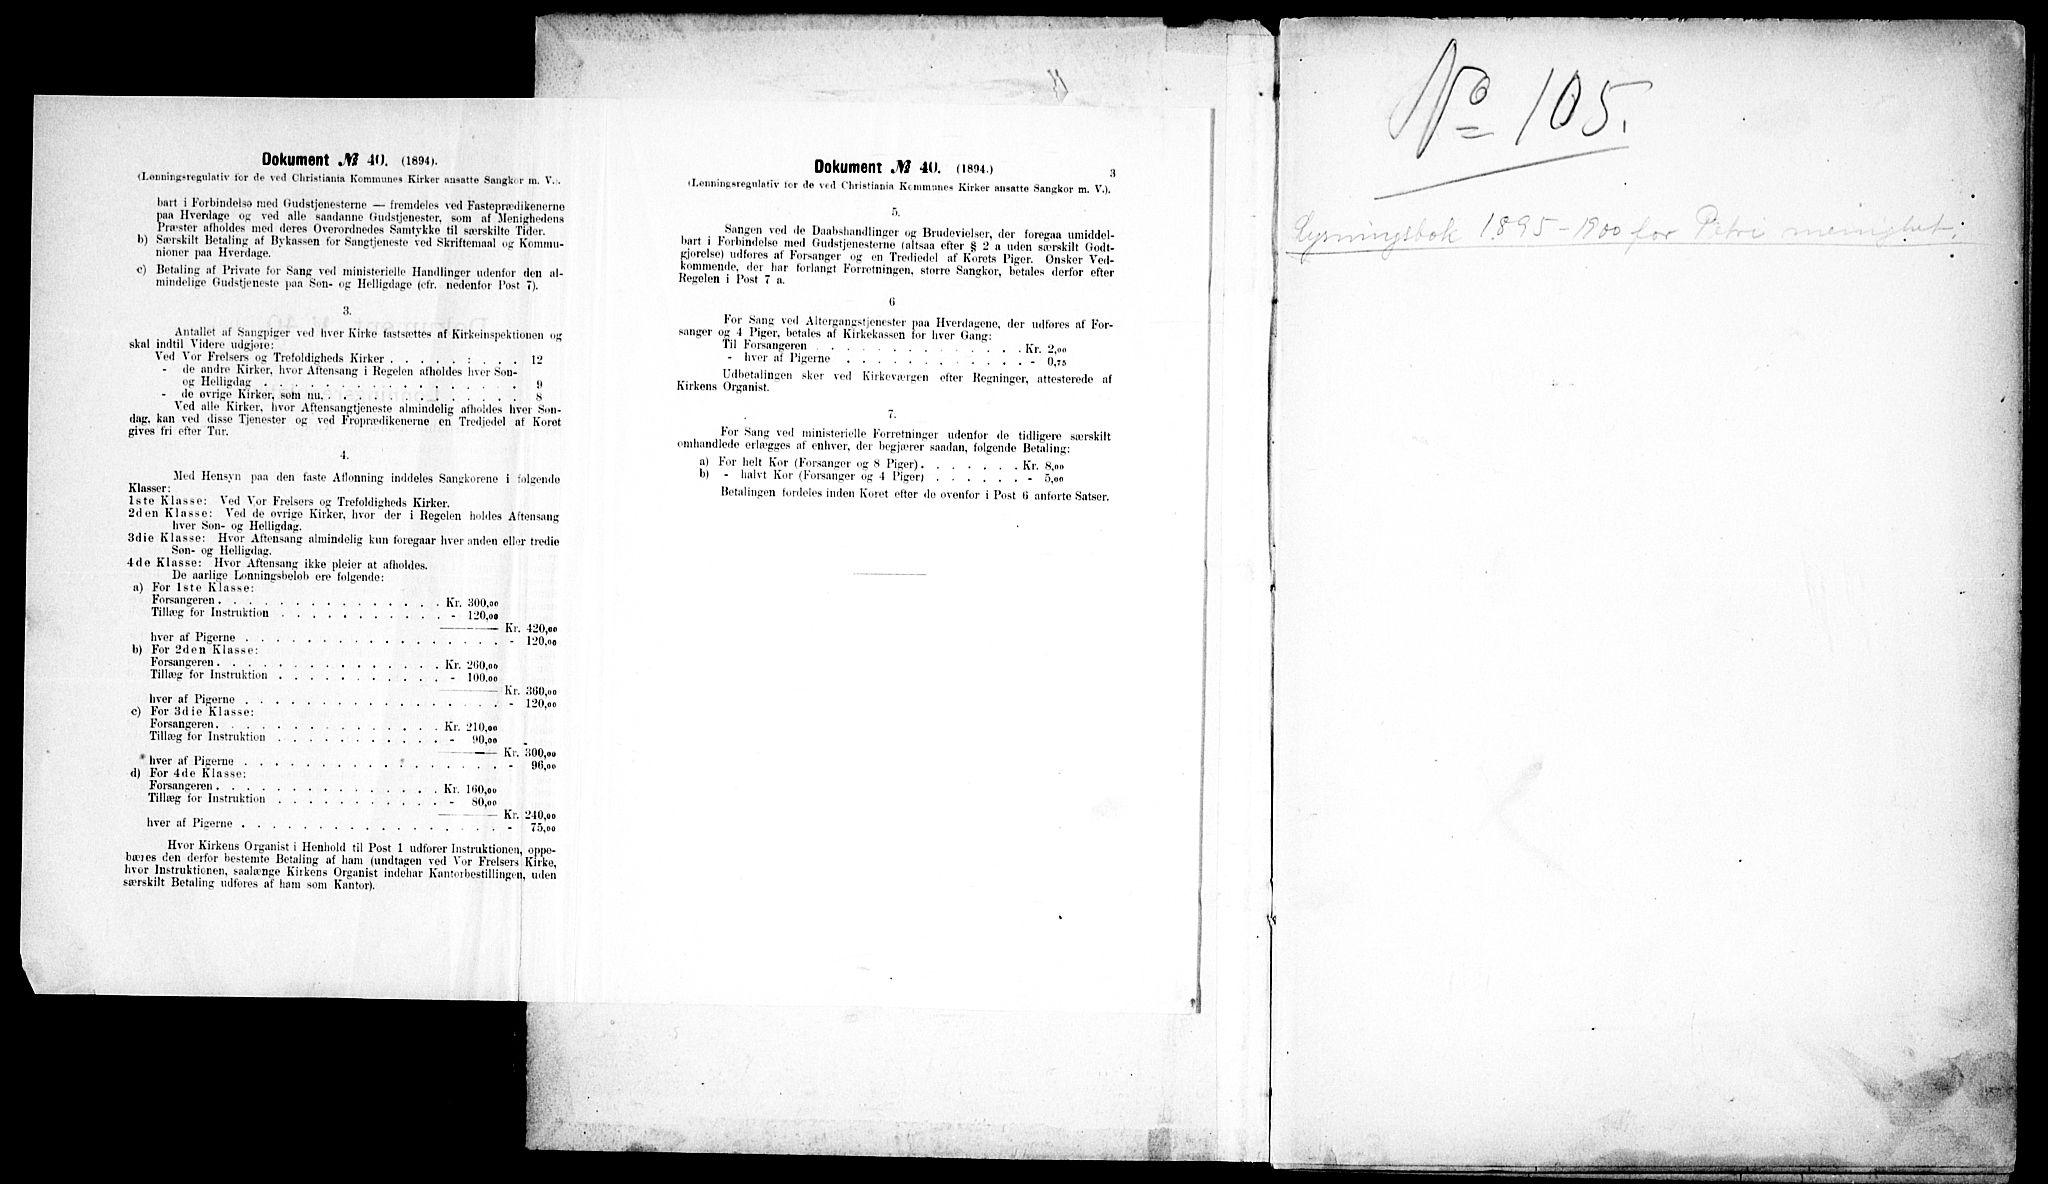 SAO, Petrus prestekontor Kirkebøker, H/Ha/L0002: Banns register no. 2, 1895-1900